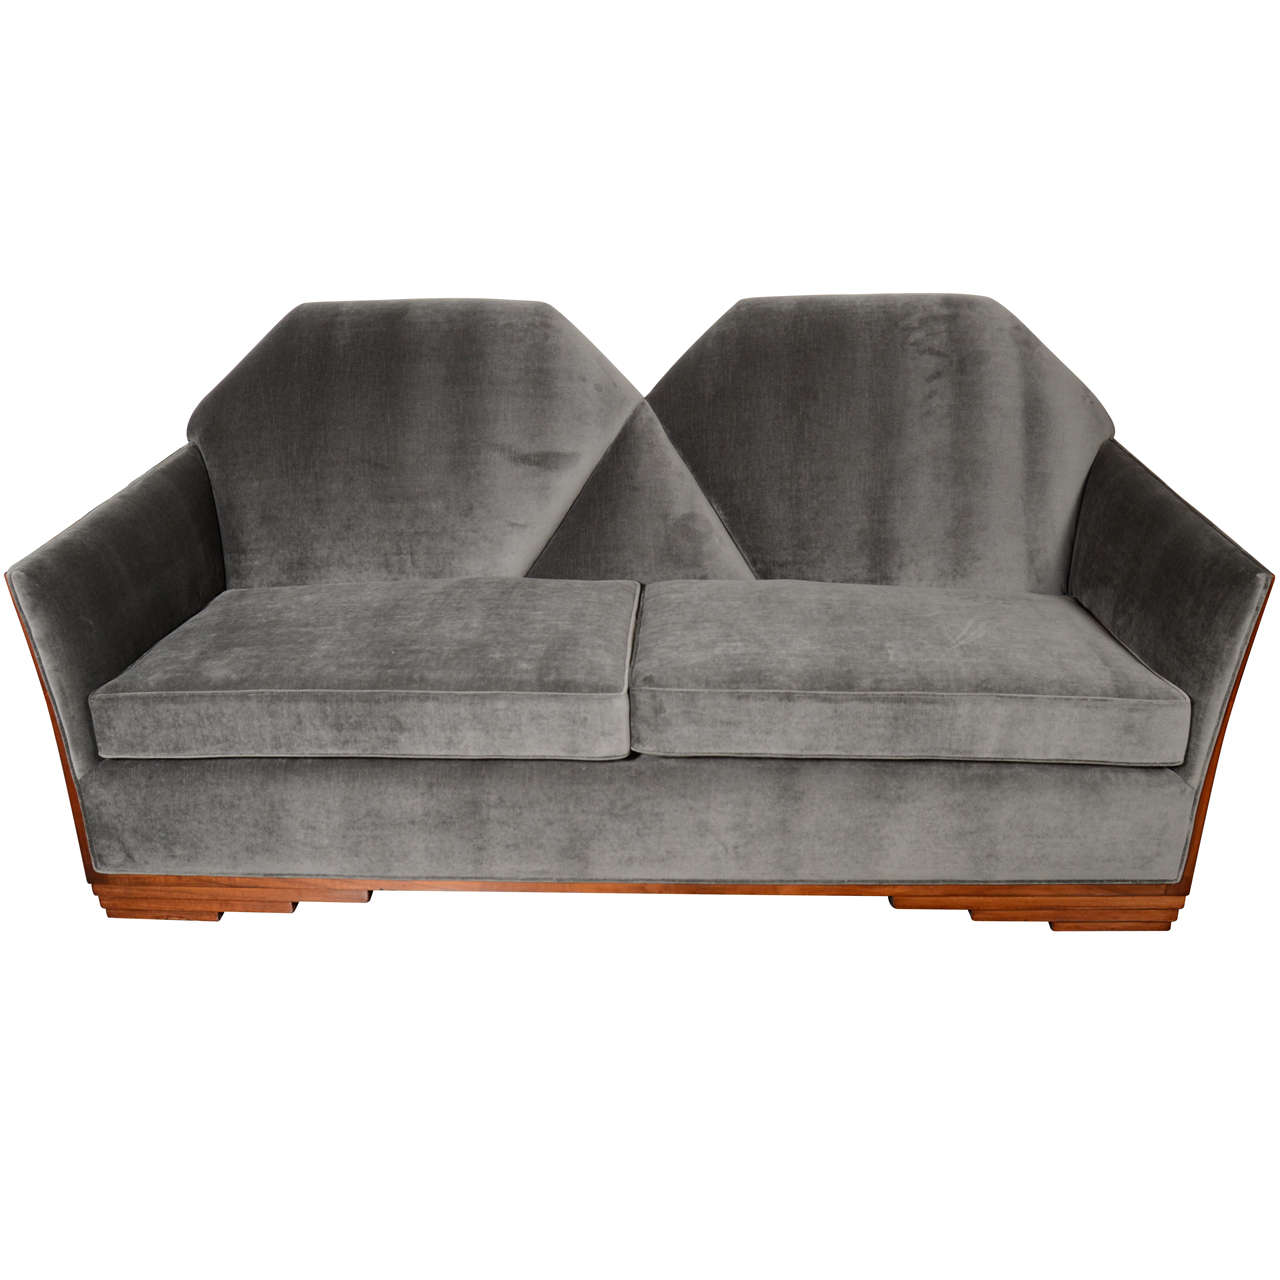 Cubist art deco skyscraper style sofa in luxurious grey for Art deco style sofa